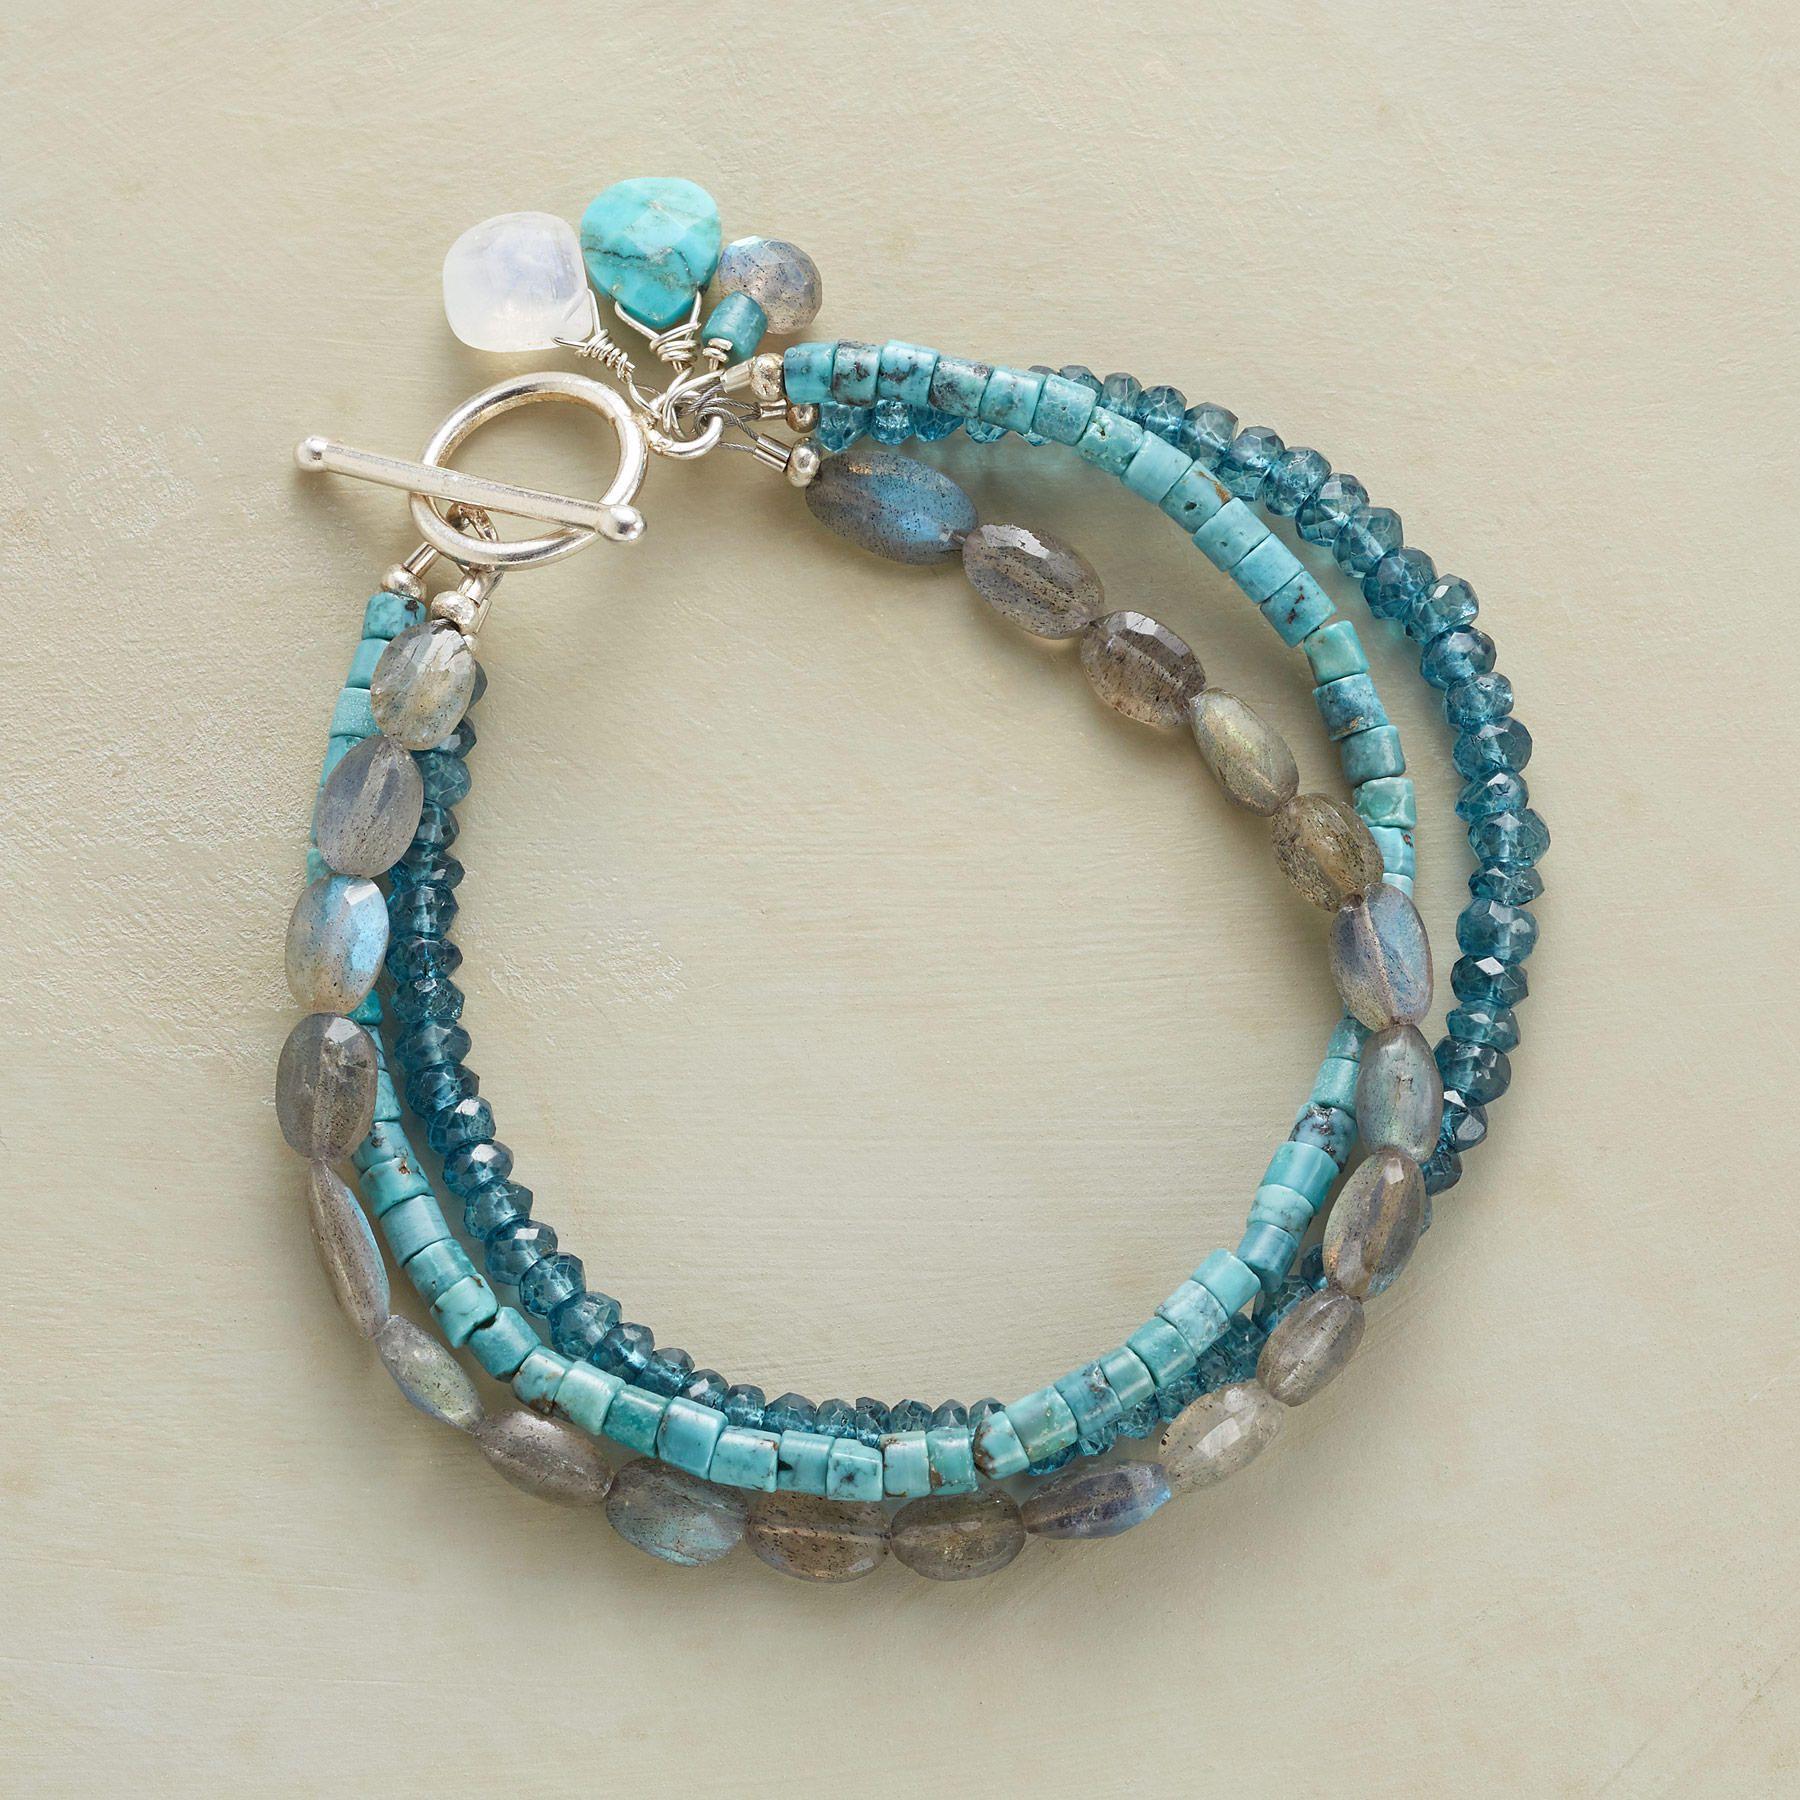 SHADY DAY BRACELET -- Three strands span the blue-gray